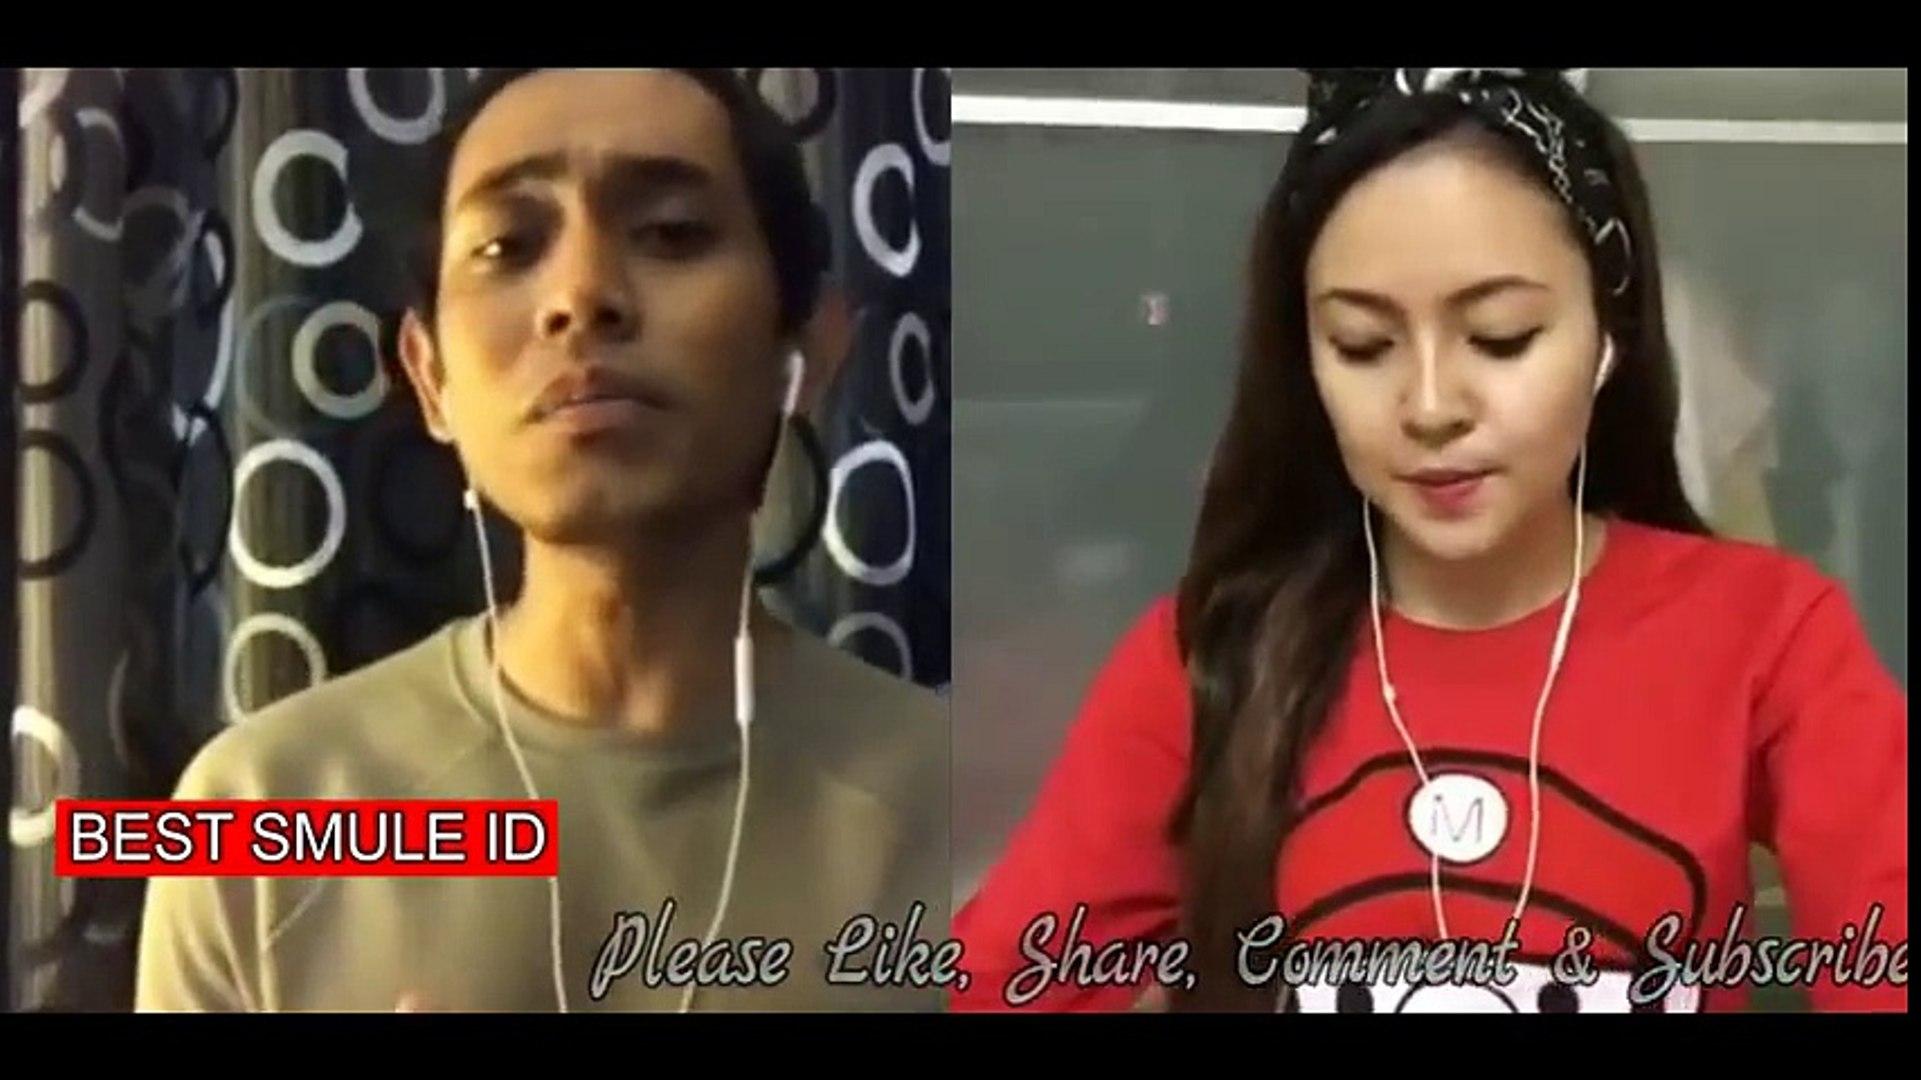 CIEE SAMA SAMA PAKAI BANDO SAAT DUET KHAI FT SHIMA - CINTA INI MEMBUNUHKU - YouTube